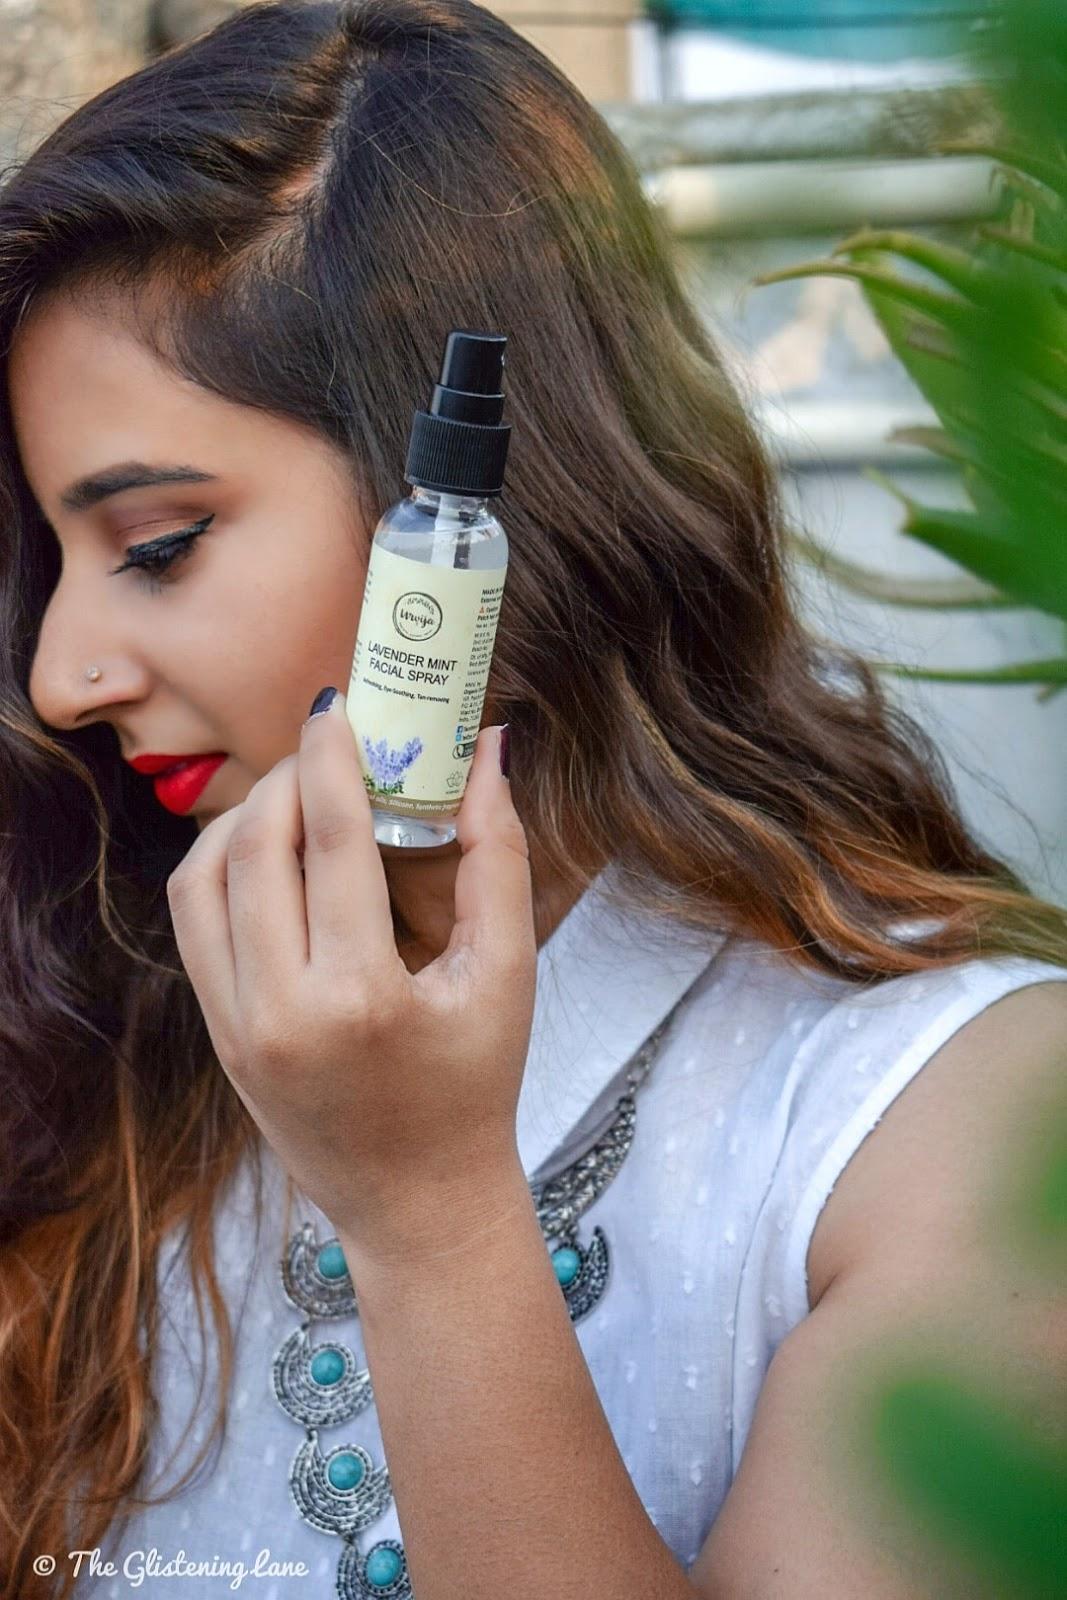 Urvija Lavender & Mint Facial Spray